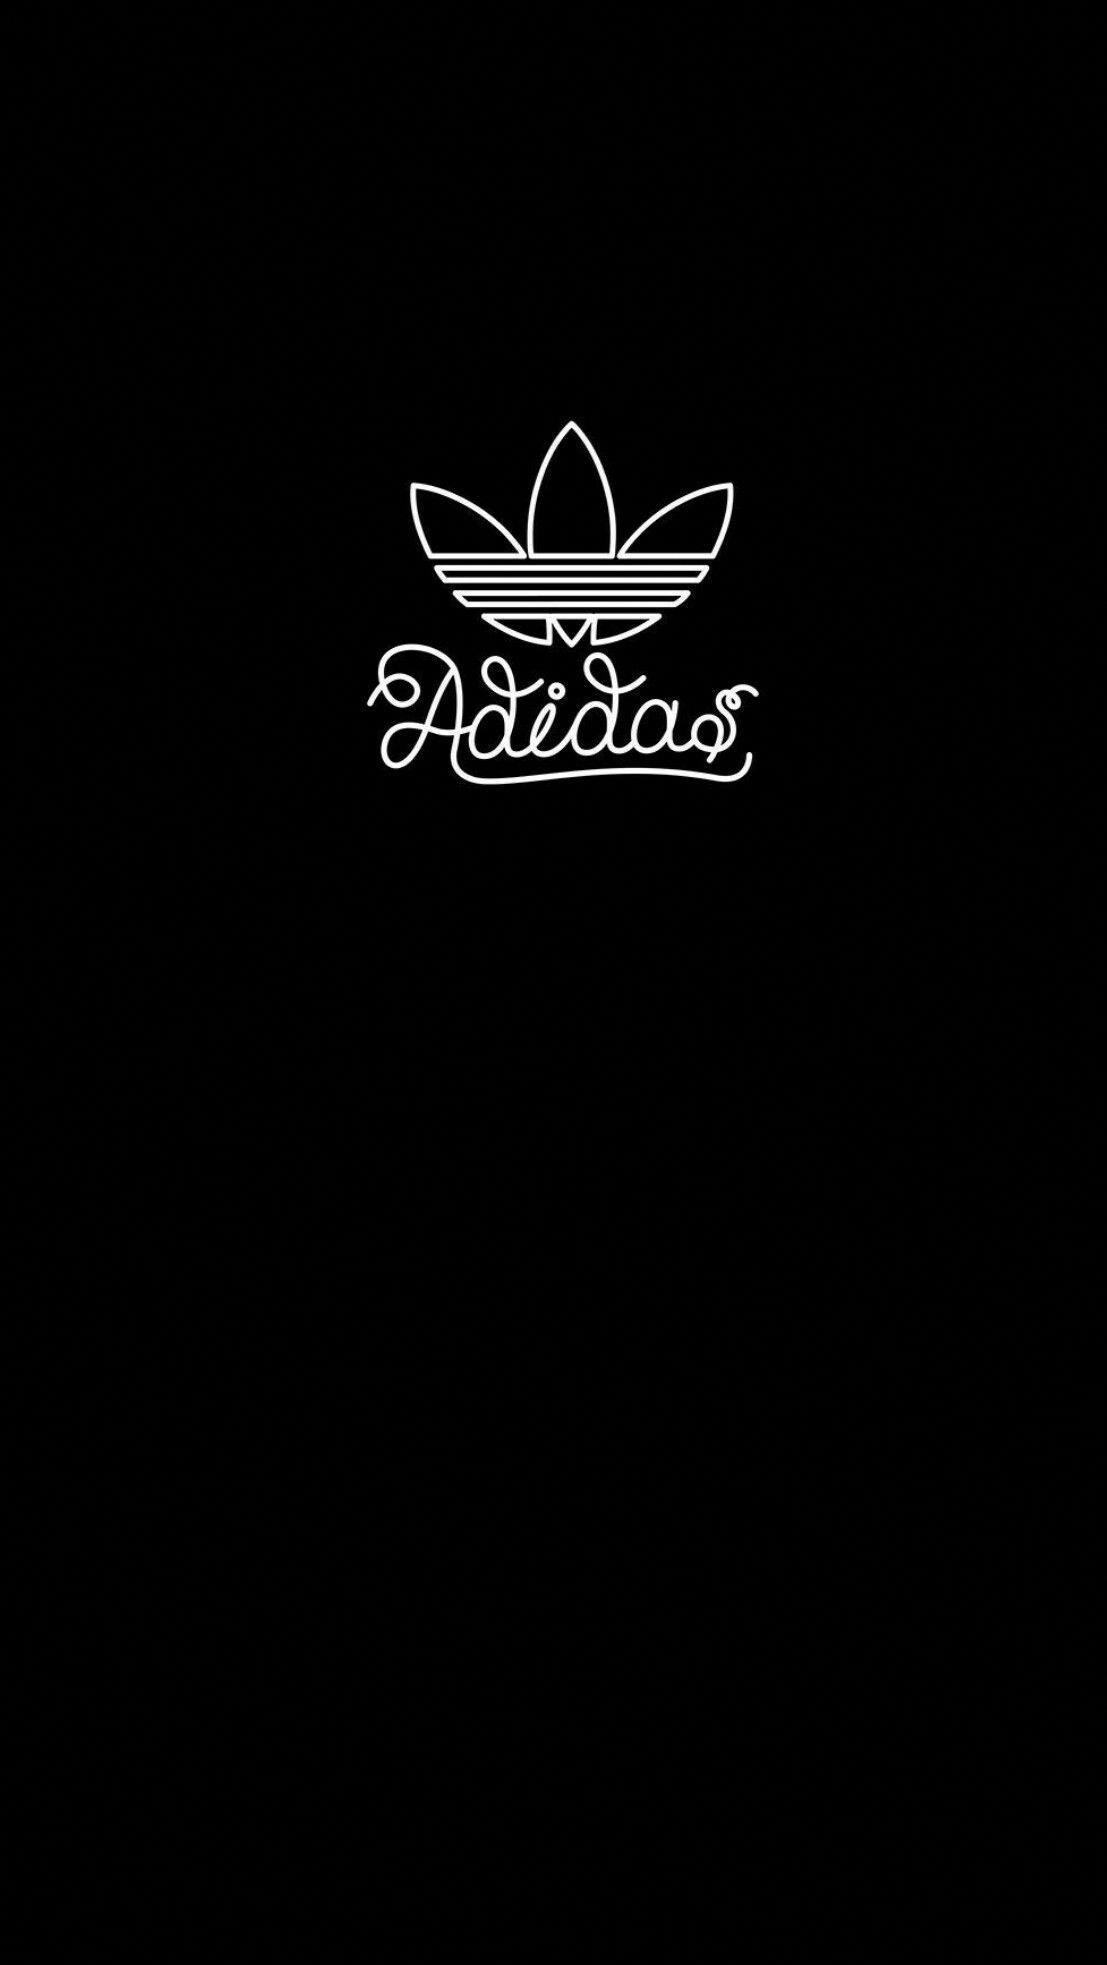 1107x1965 Adidas Camouflage Wallpaper Iphone Android アディダス壁紙 壁紙 Iphone おしゃれ 壁紙 Iphone シンプル